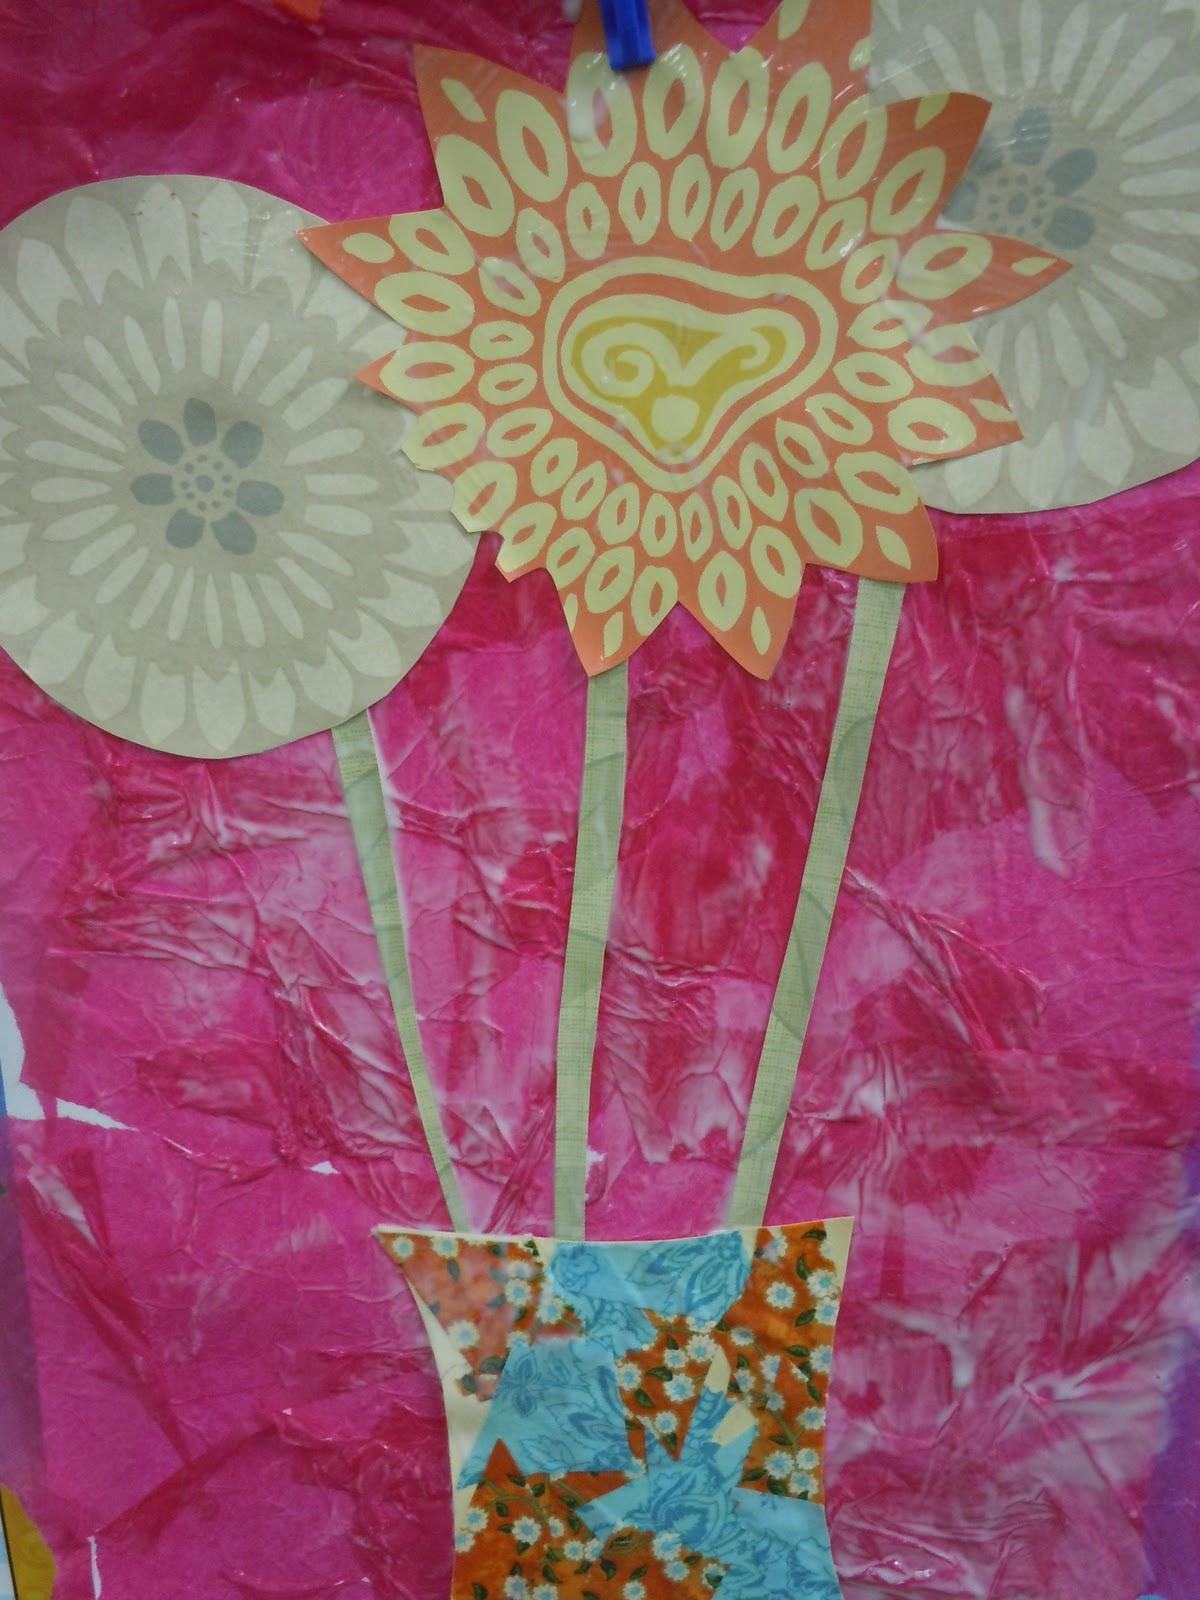 Crafts Using Wallpaper Samples 1200x1600